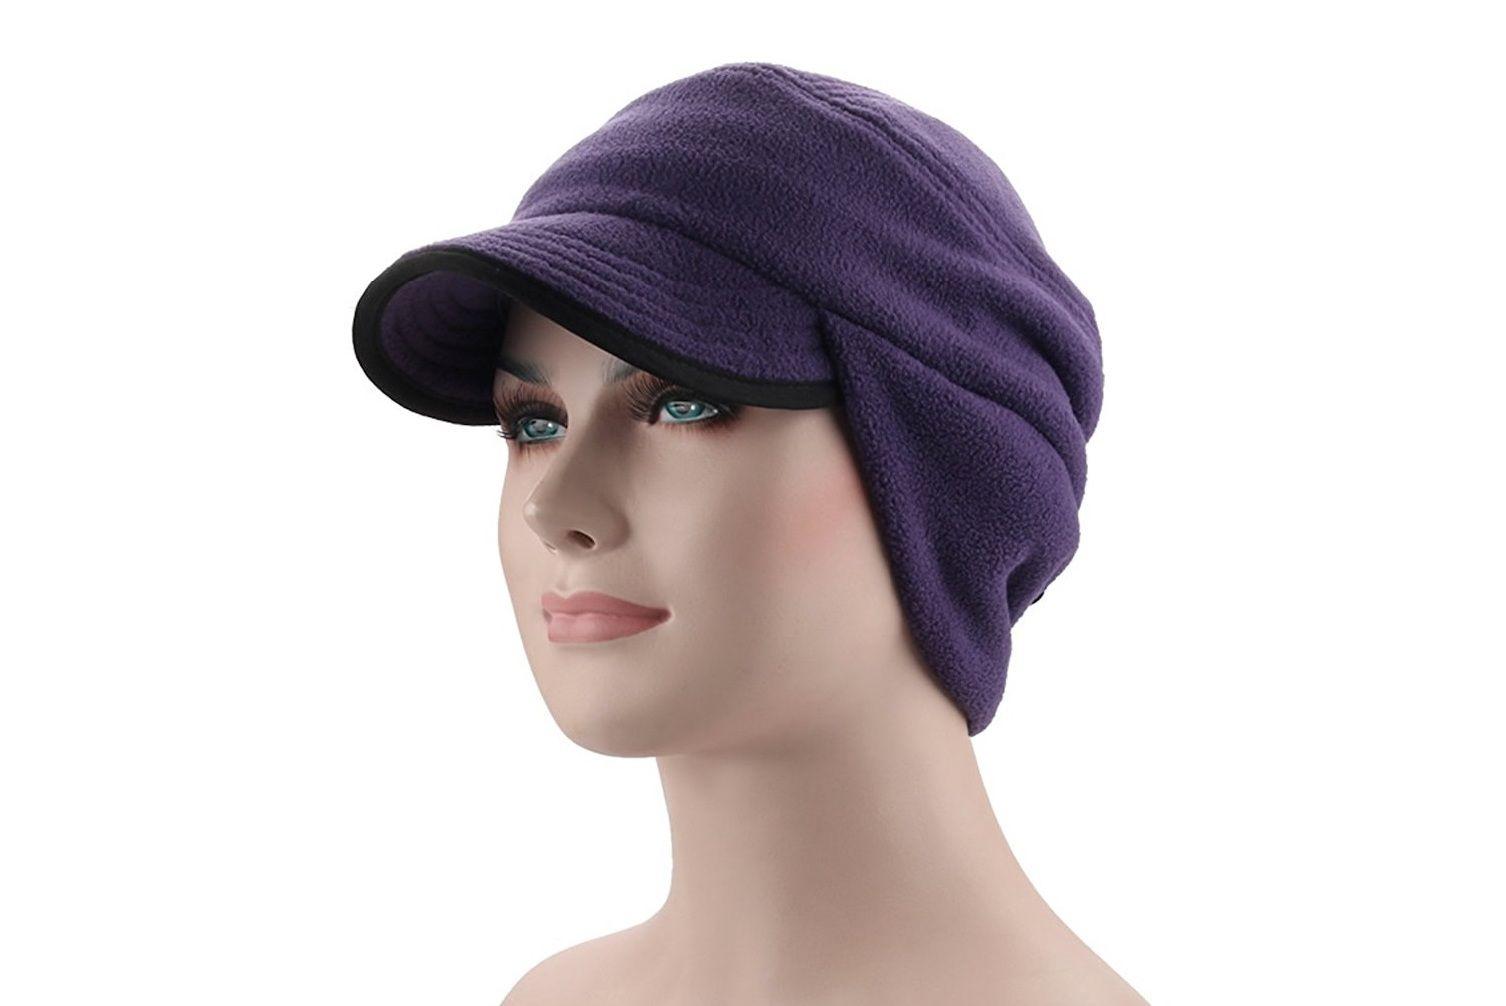 Windproof Fleece Earflap Hat with Visor 8278839174b